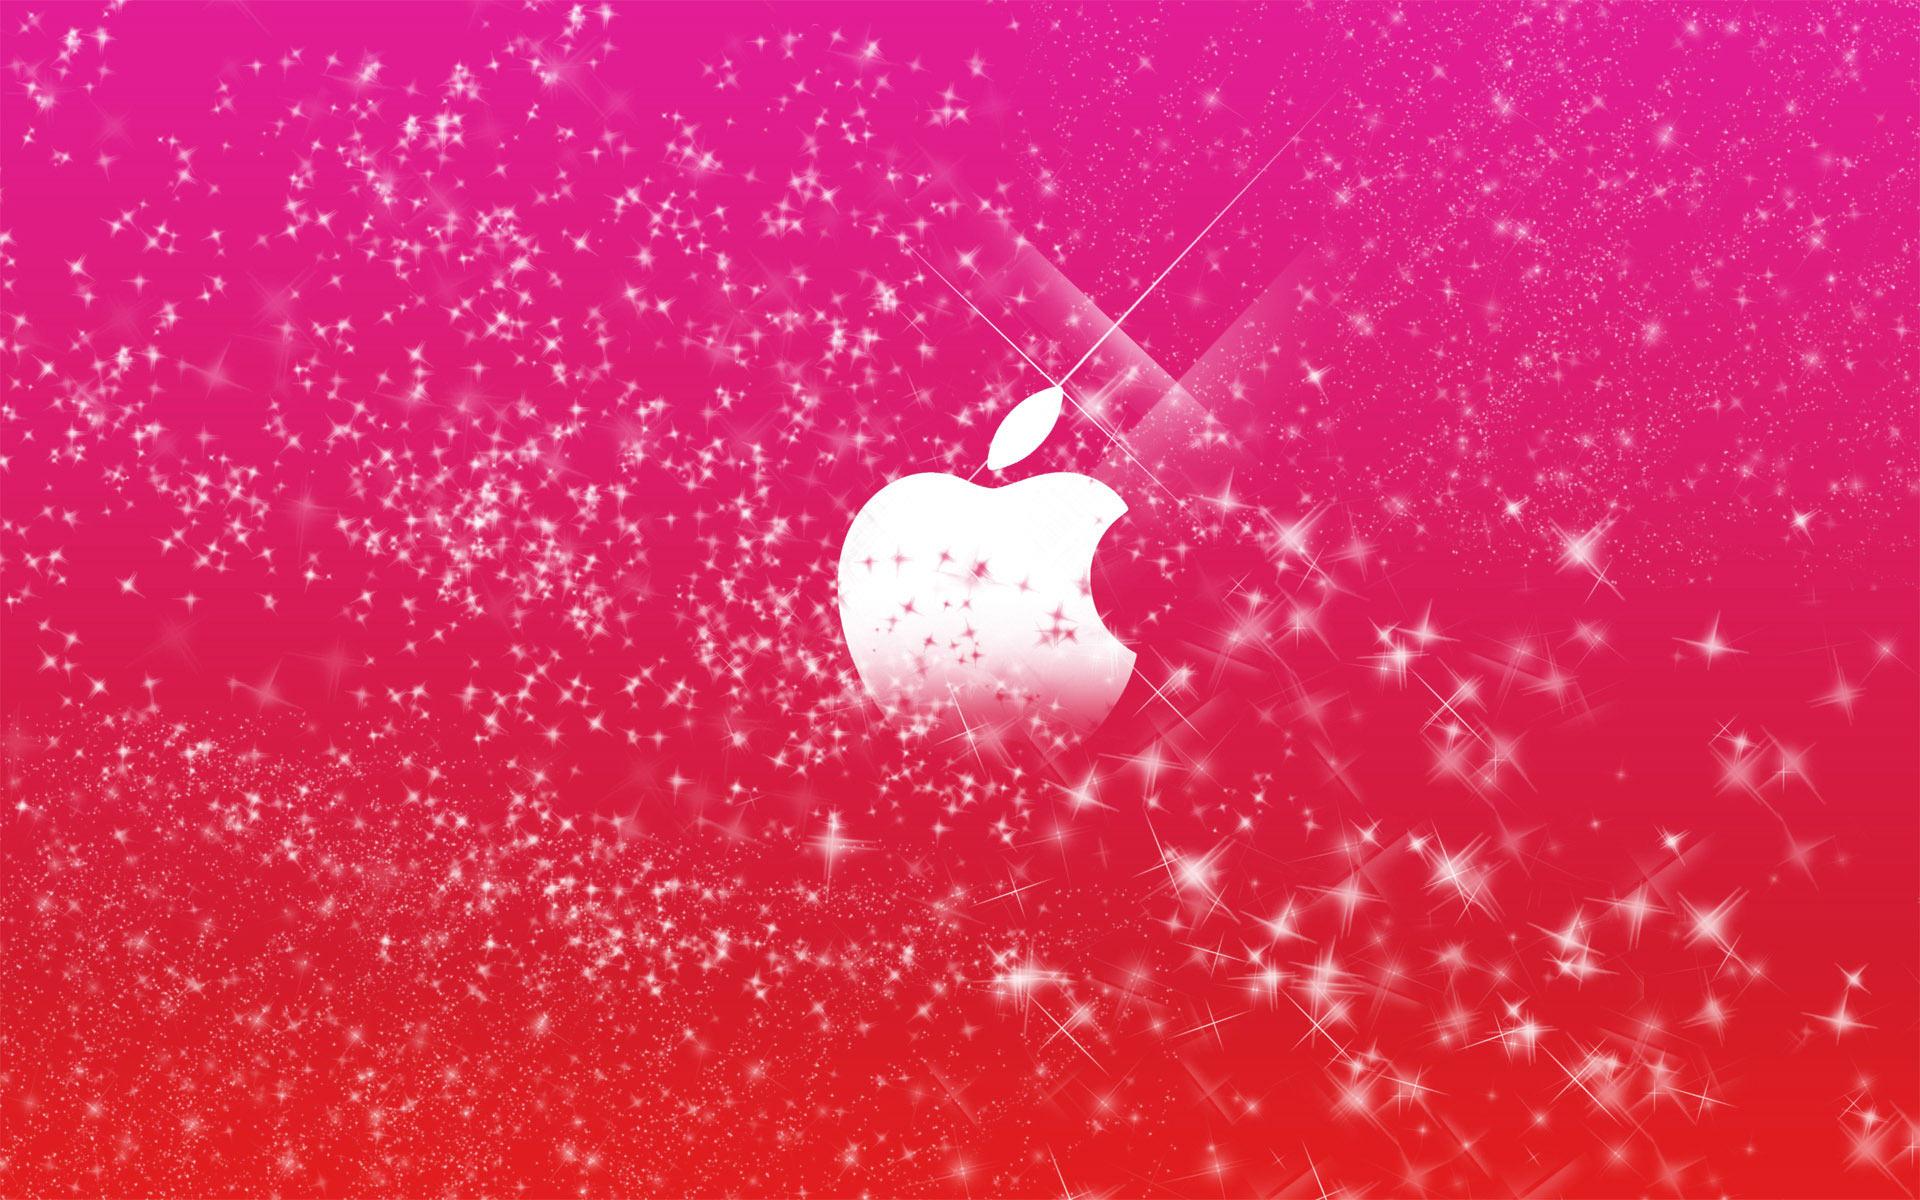 pink desktop backgrounds pink desktop backgrounds free desktop